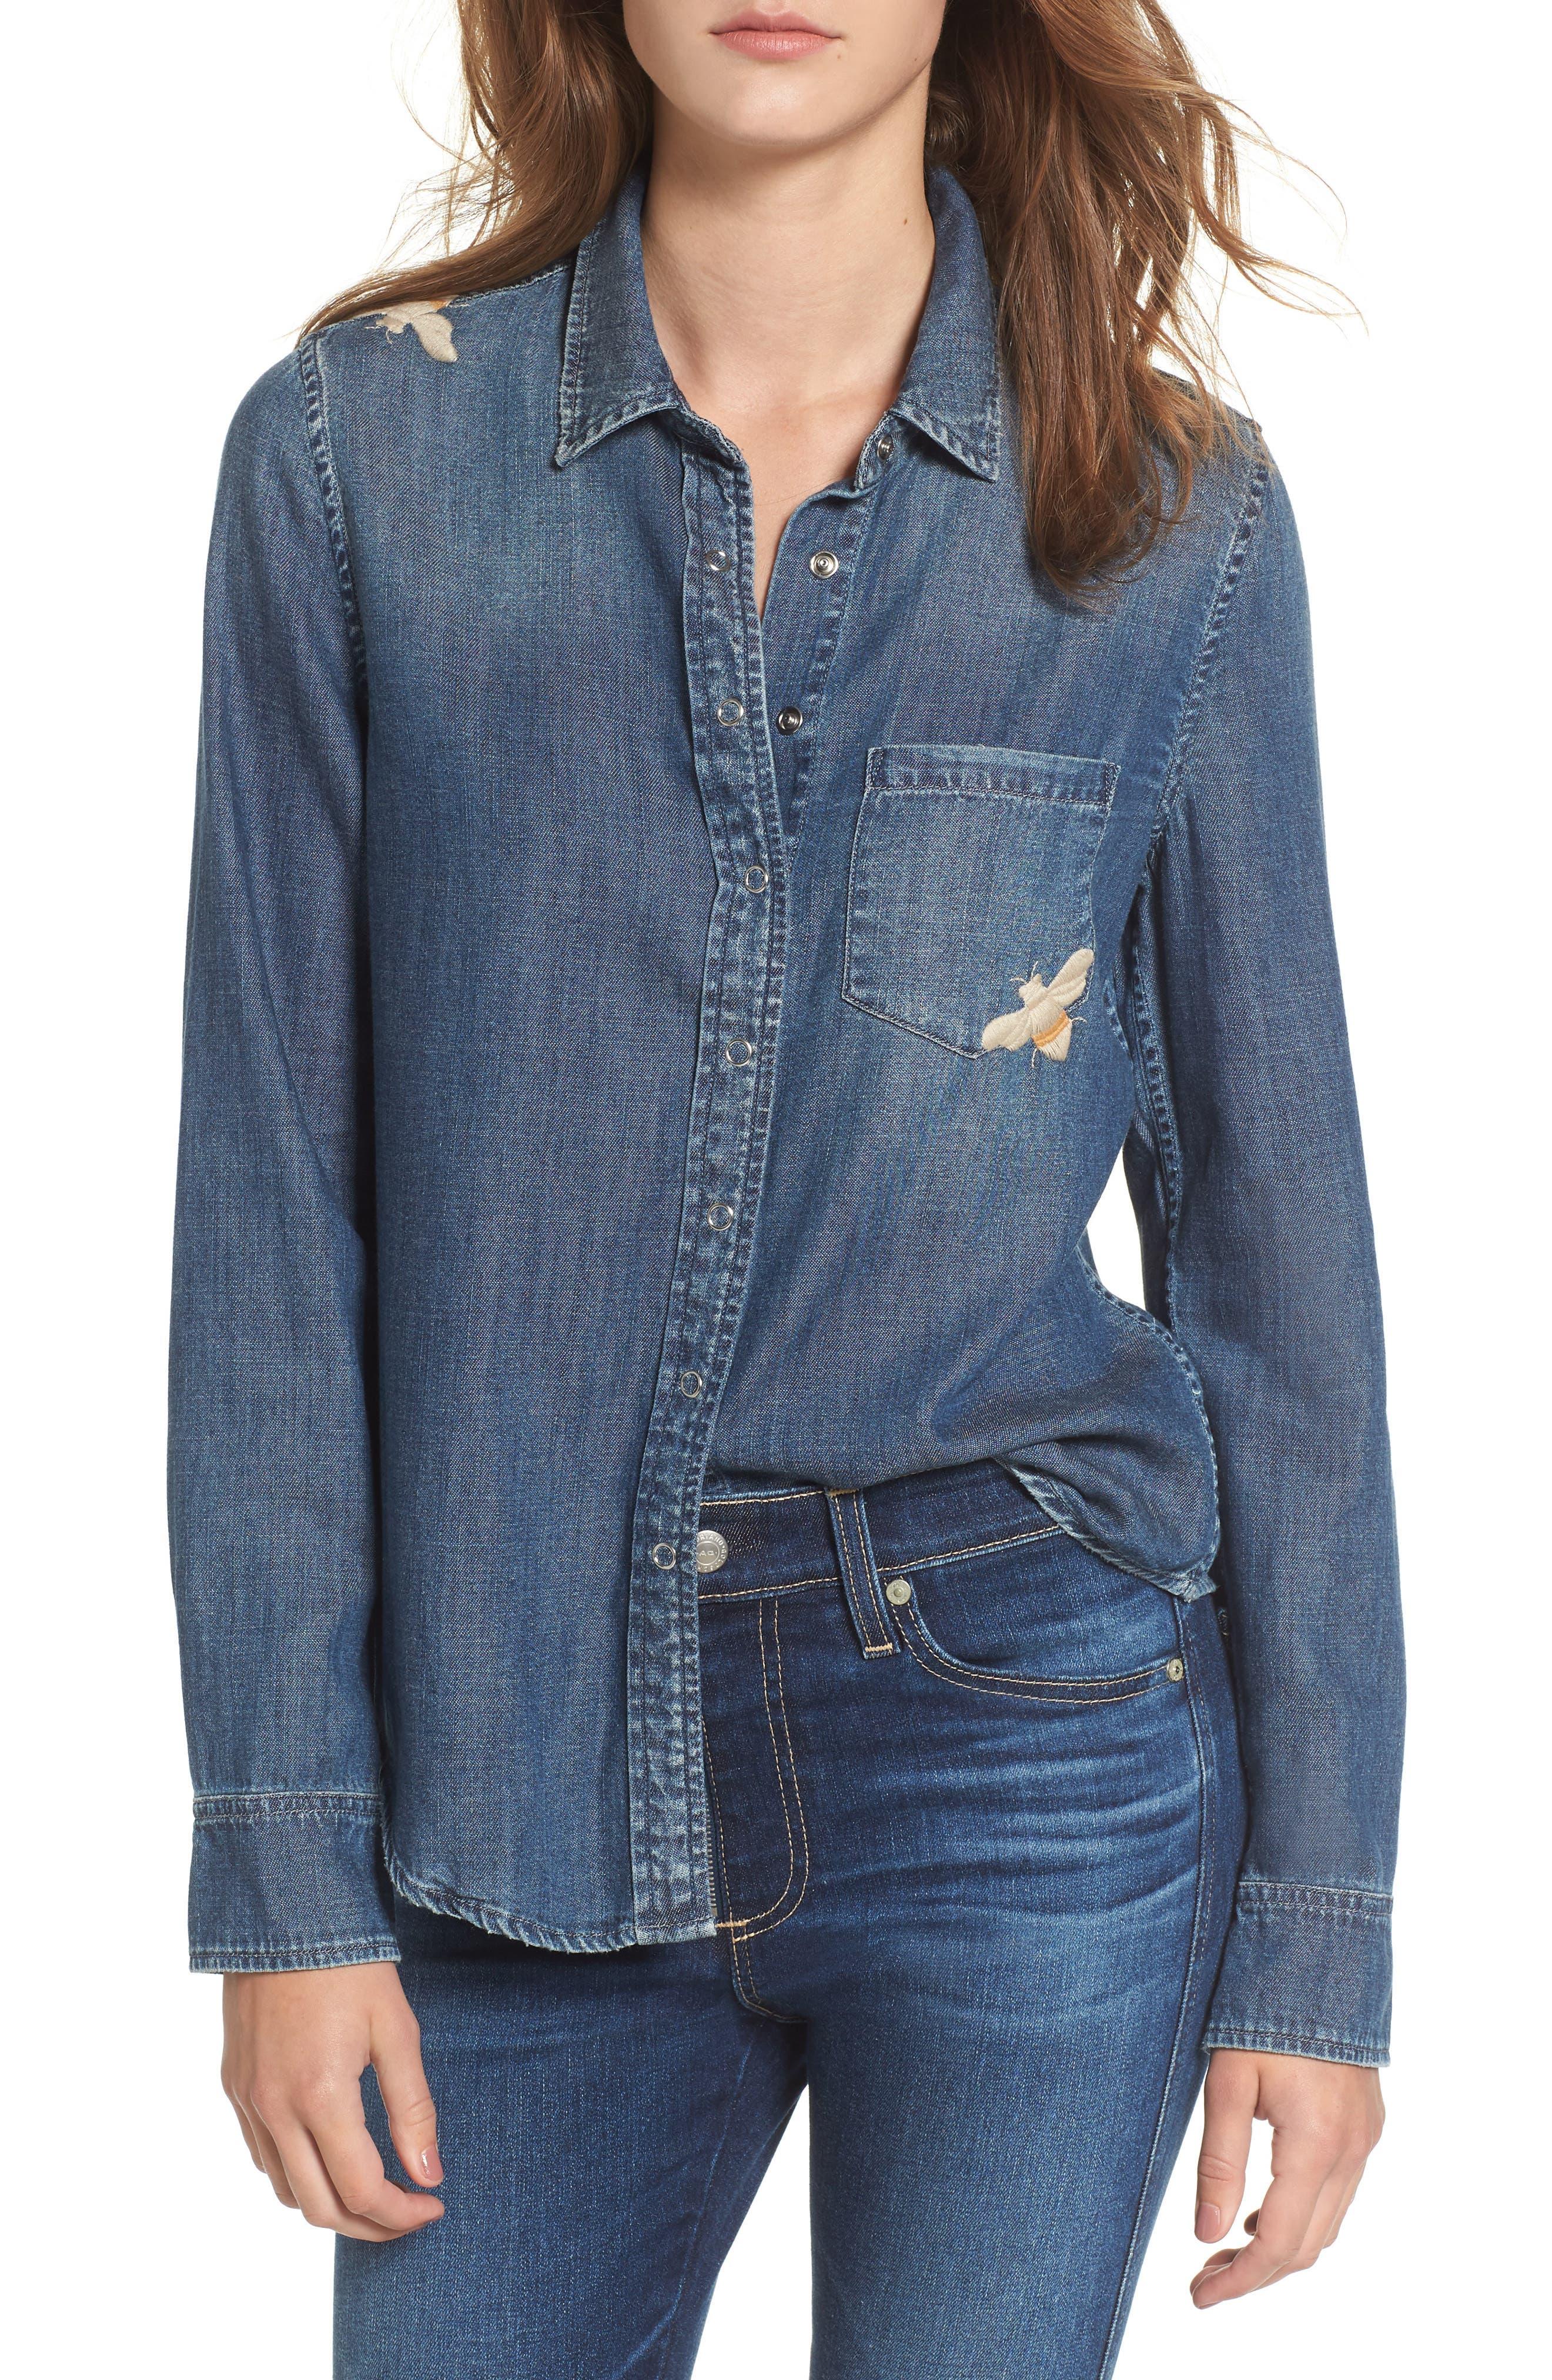 Main Image - AG Joanna Embroidered Denim Shirt